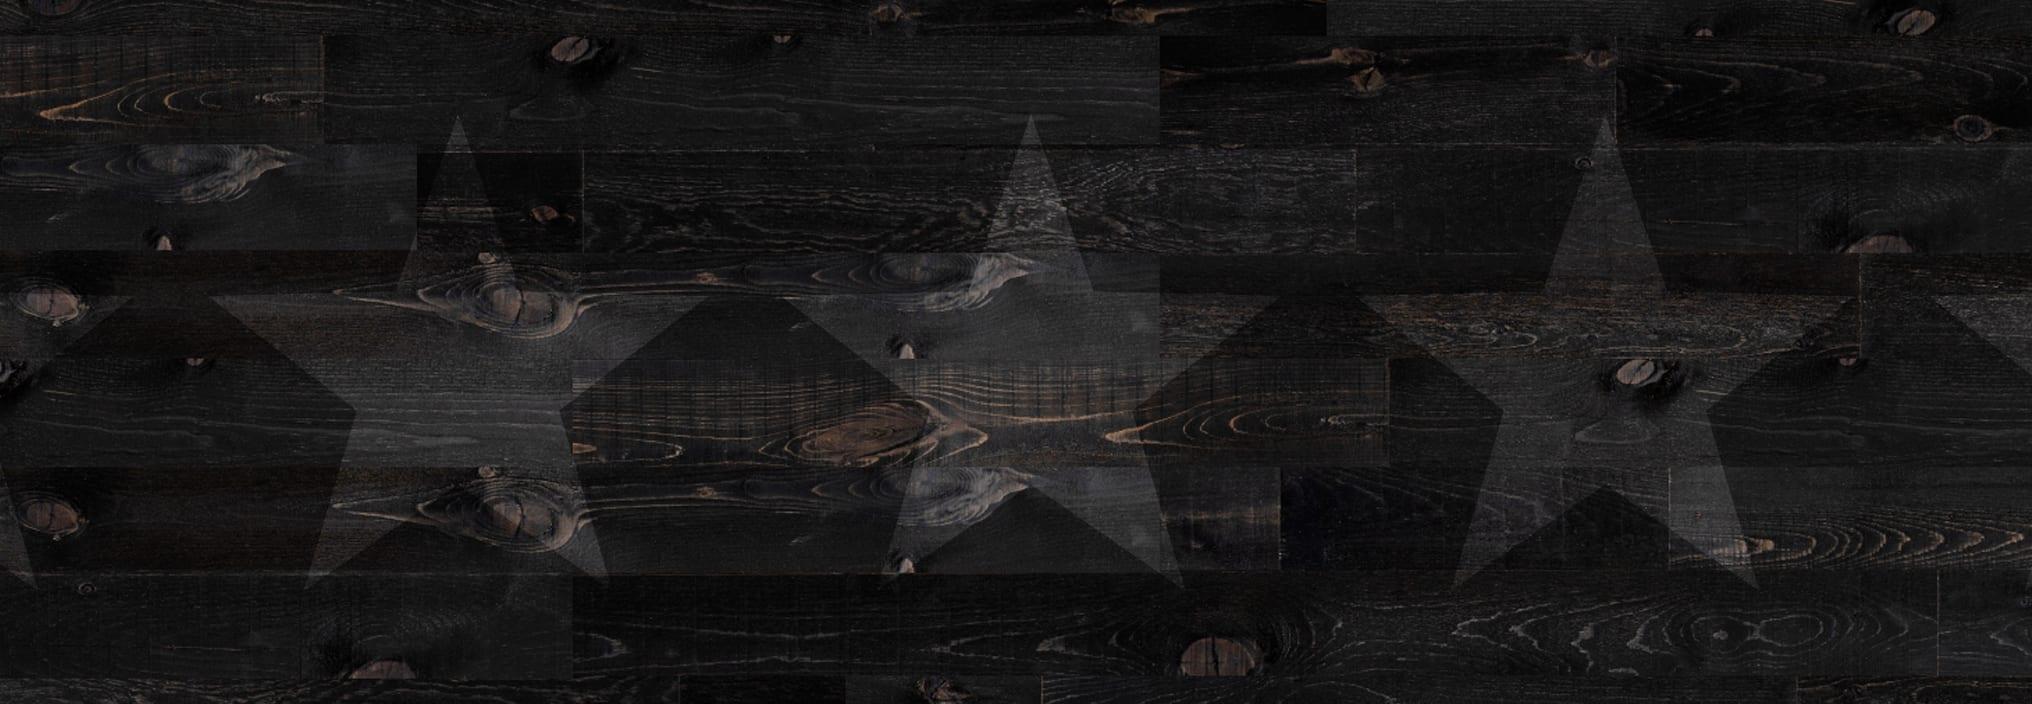 onyx with stars